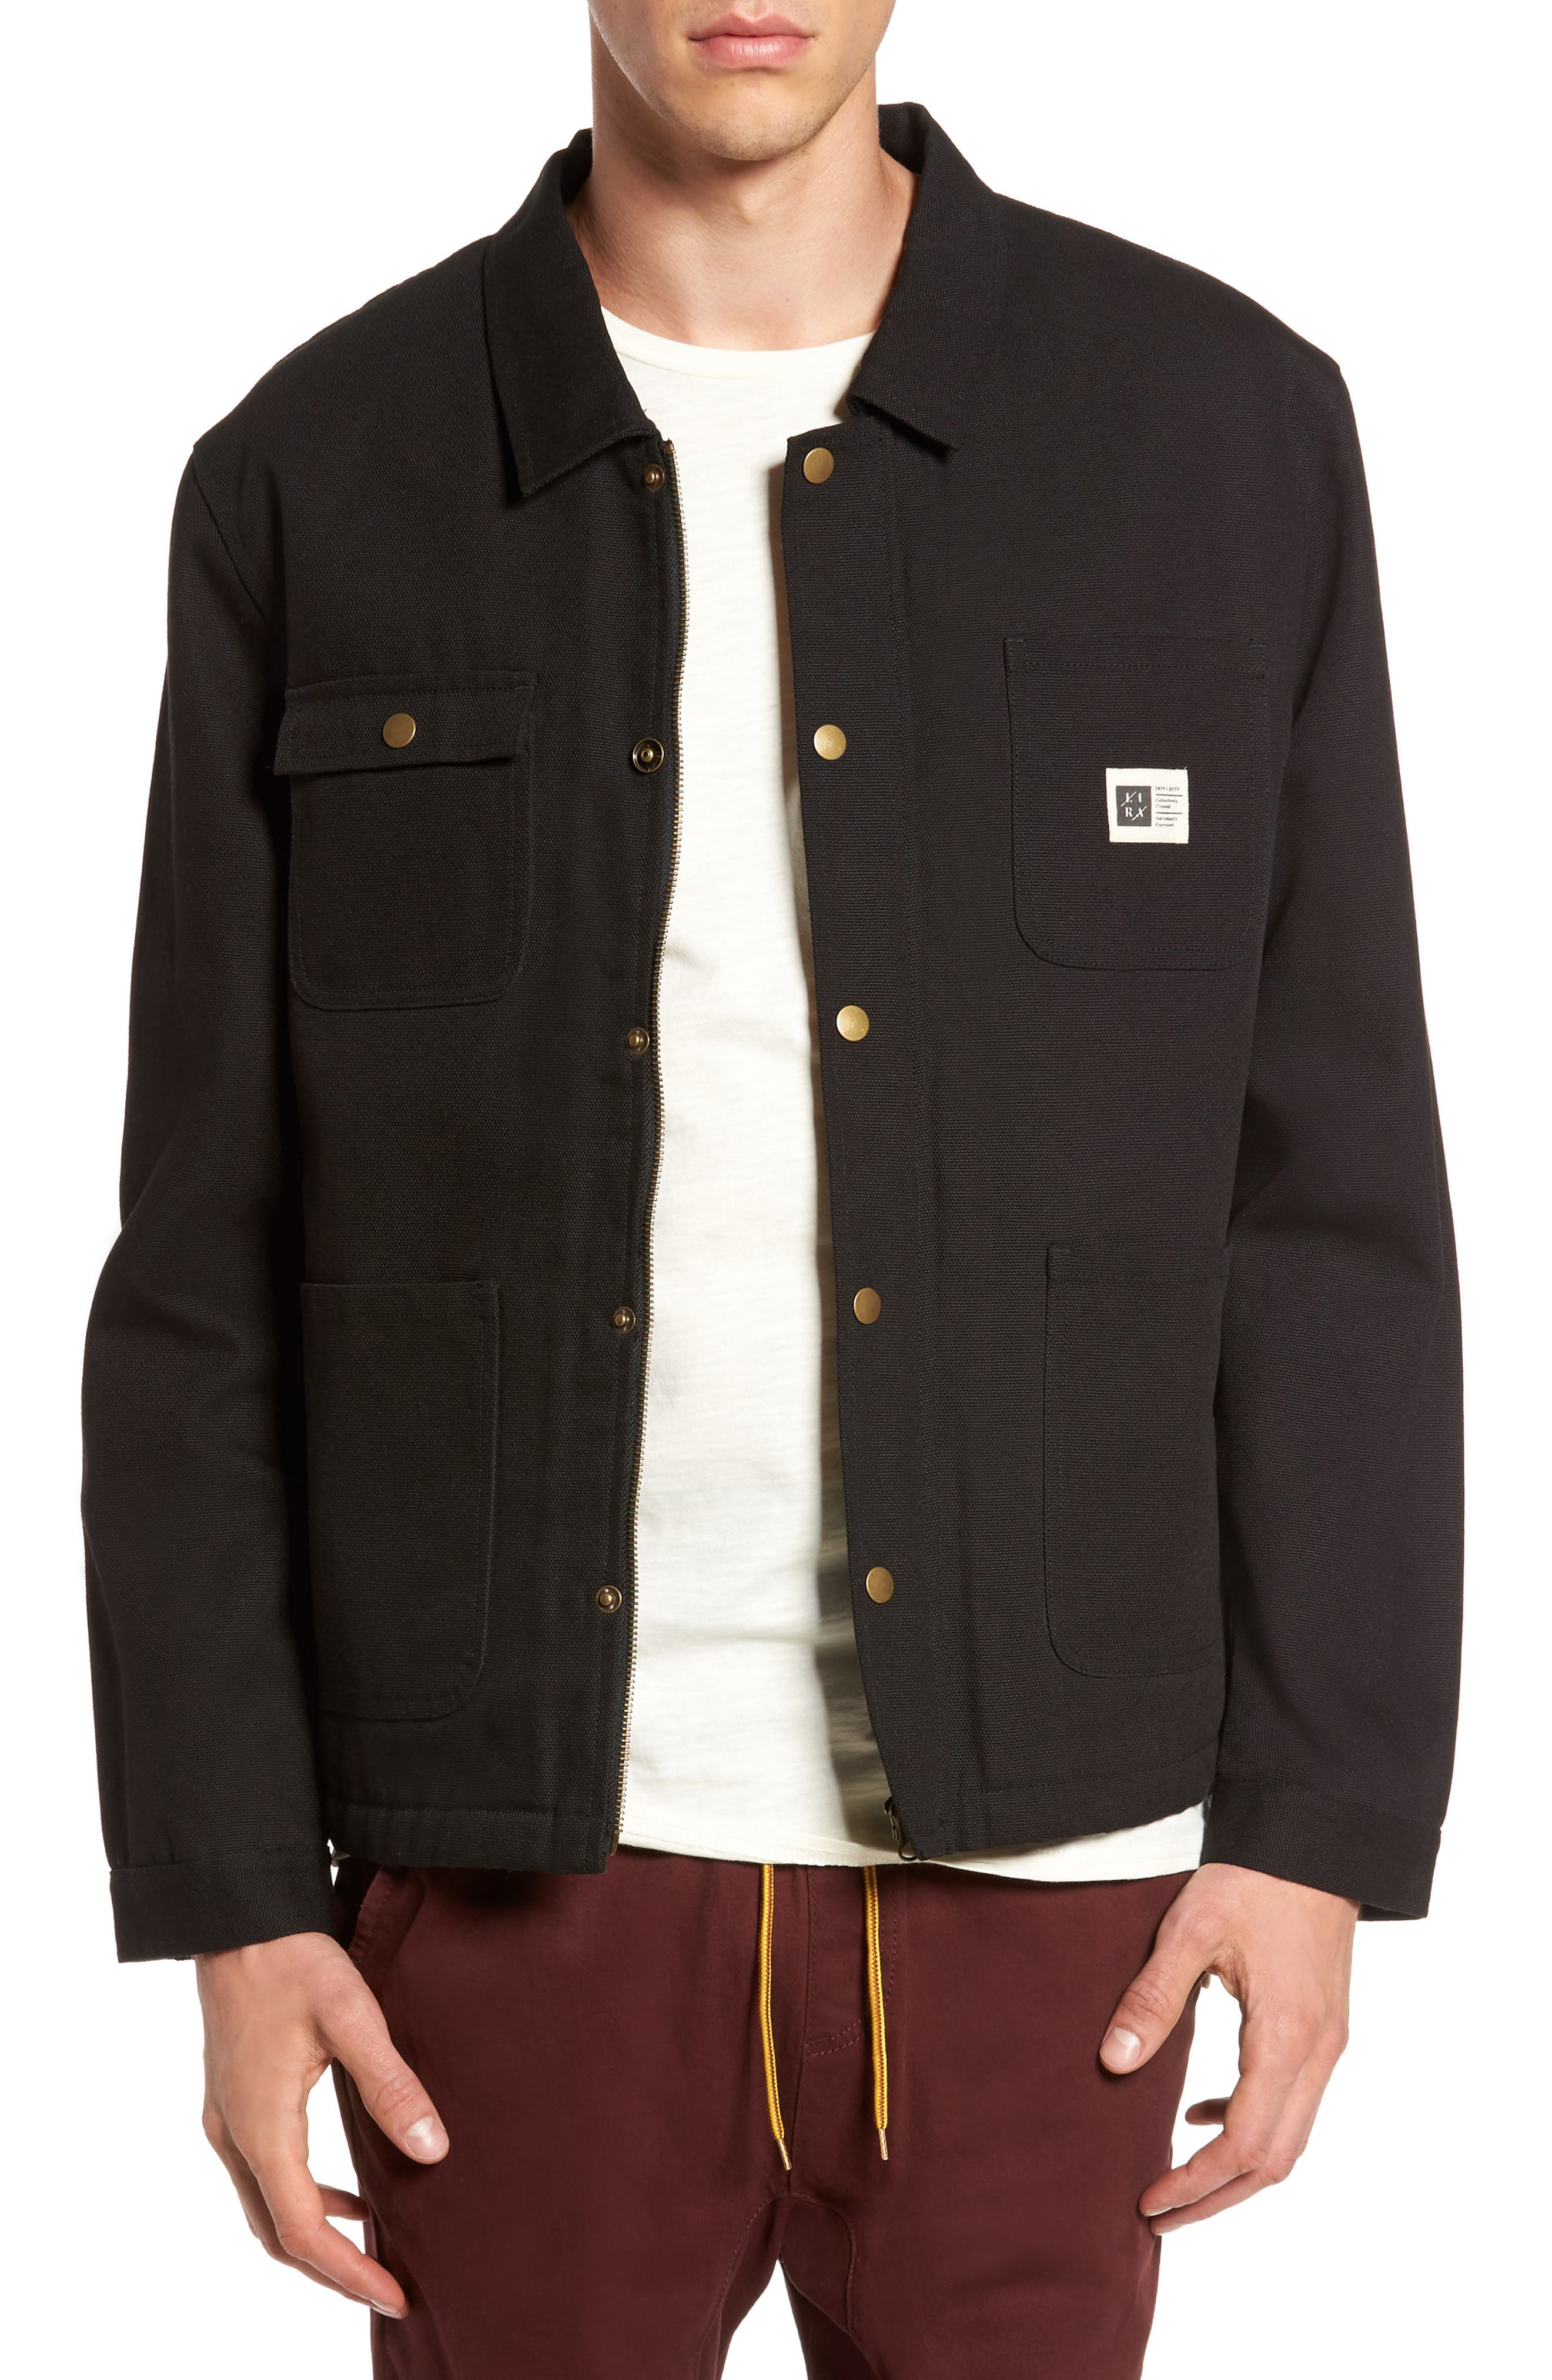 Lira Clothing Chandler Jacket